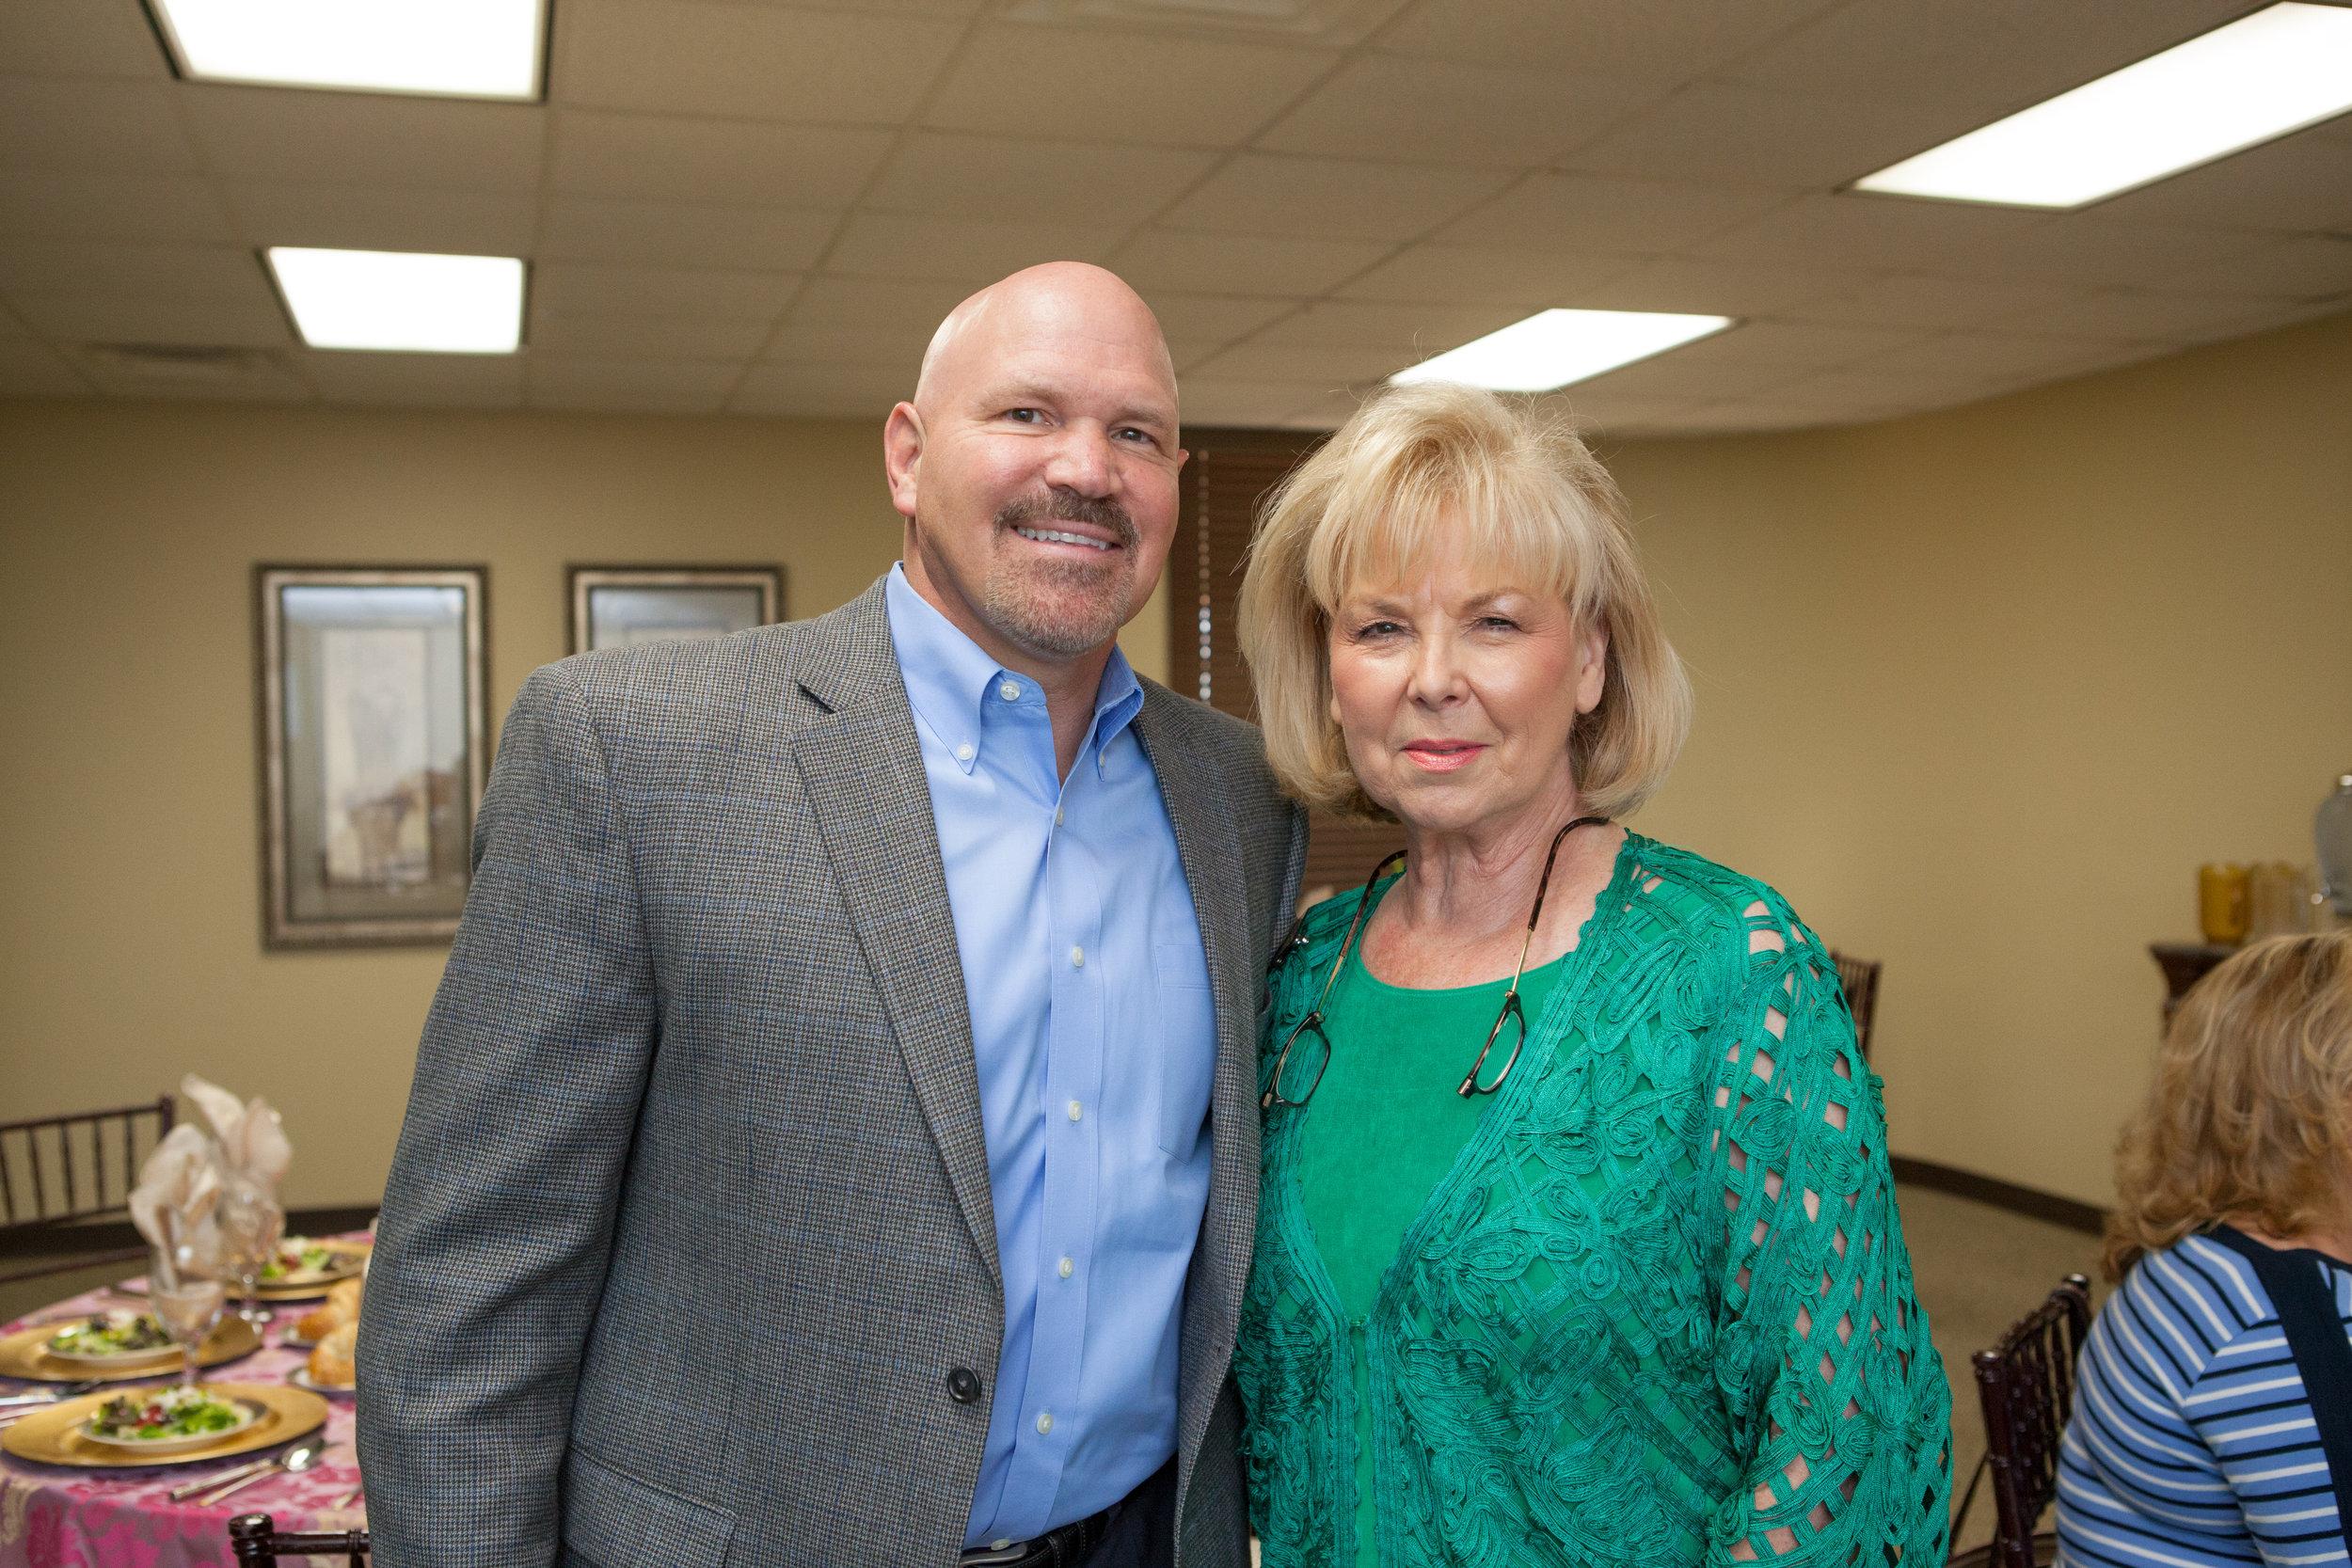 Pastor Jeff Schreve and Pat Nance